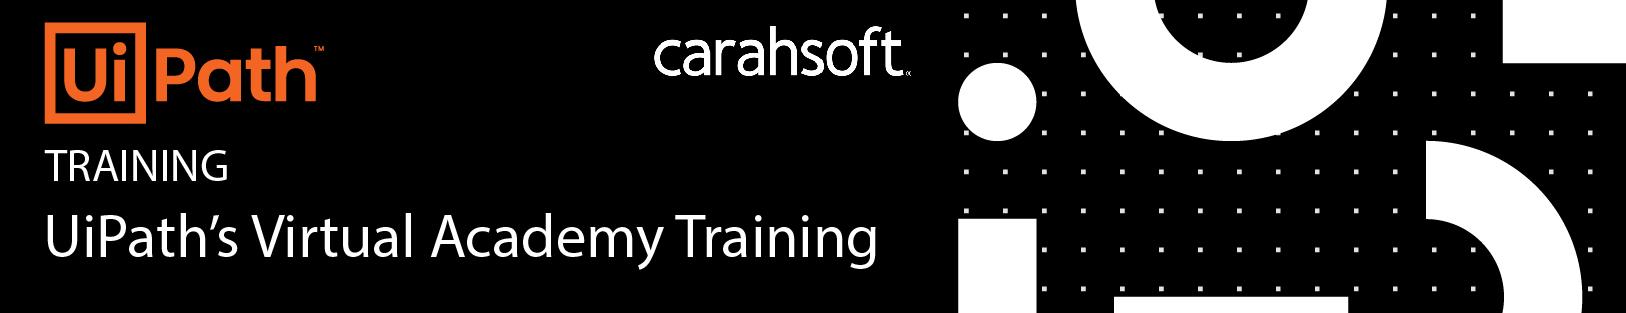 Virtual Academy Microsite-01.jpg